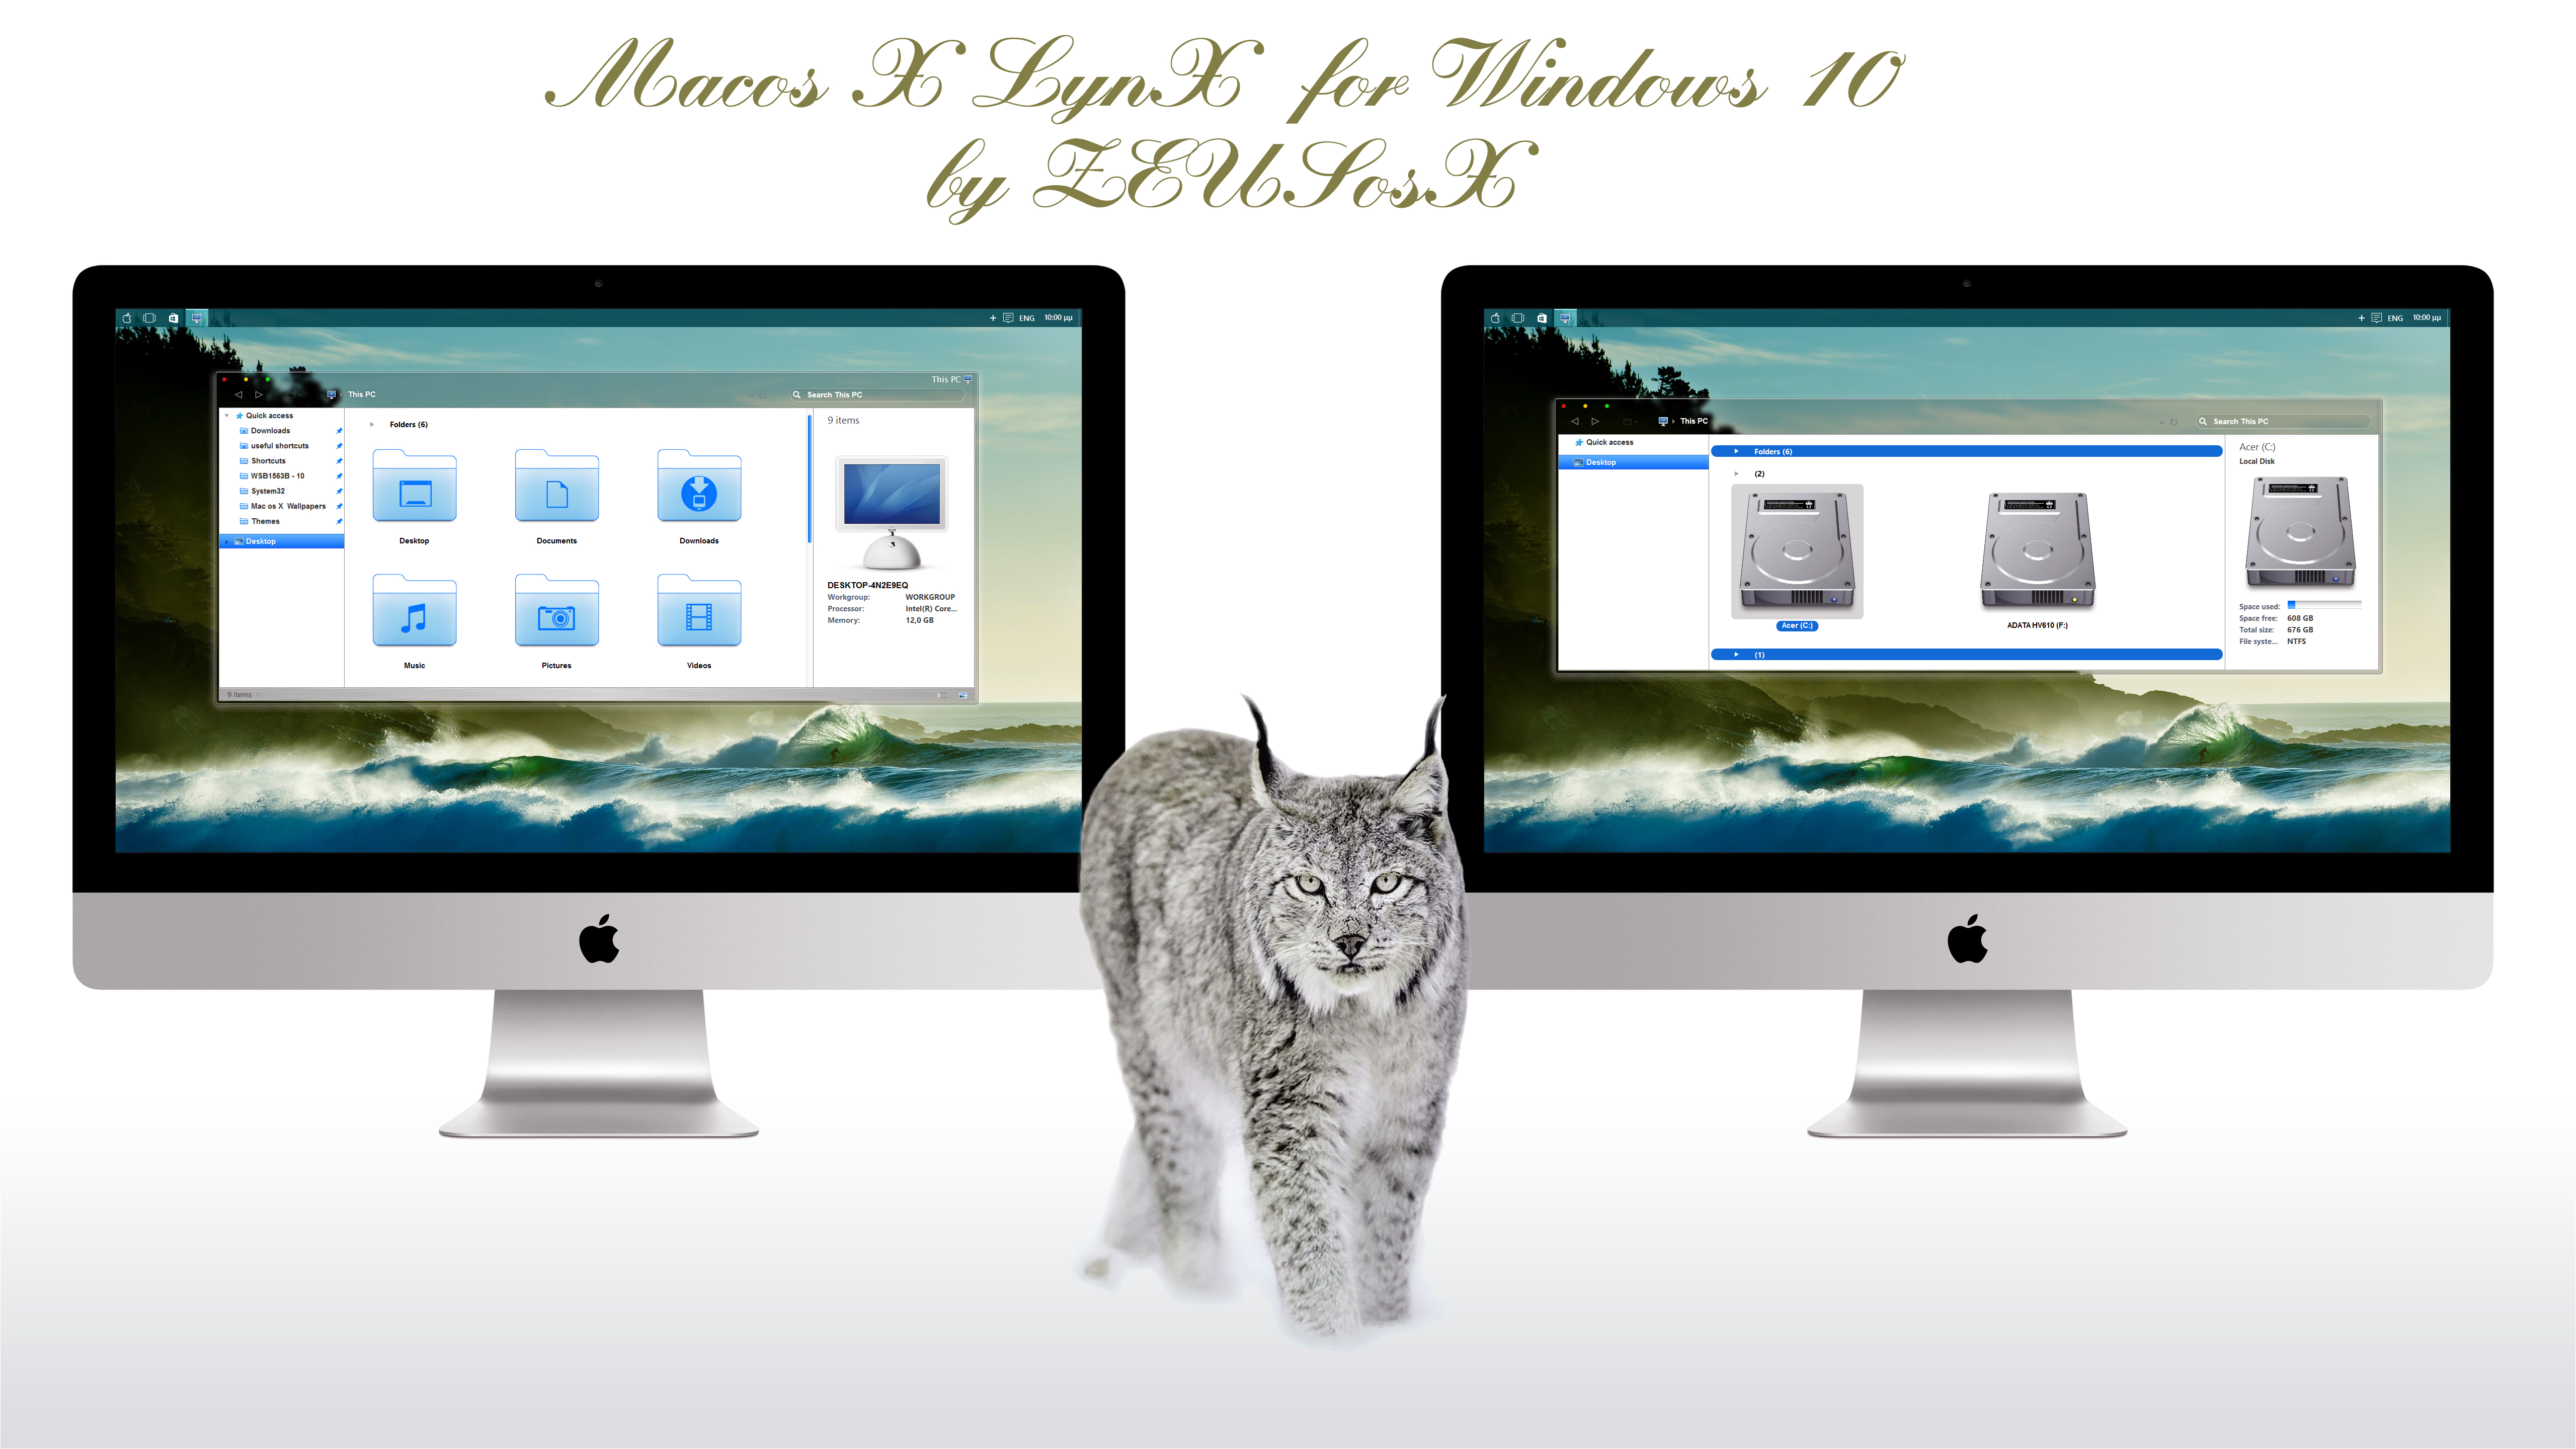 Mac os X LynX for Windows 10 rtm by ZEUSosX on DeviantArt